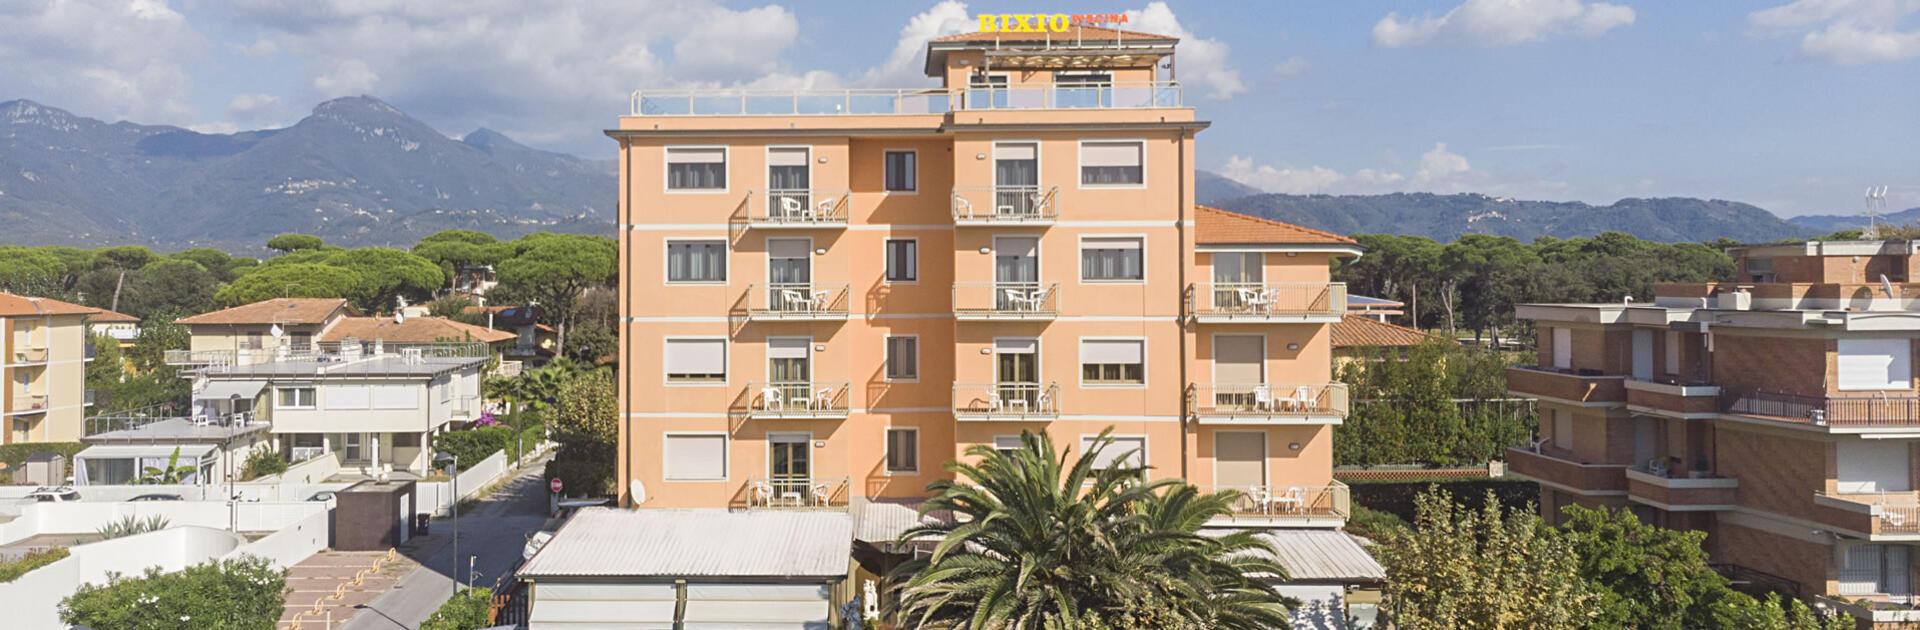 hotelbixio it hotel 009